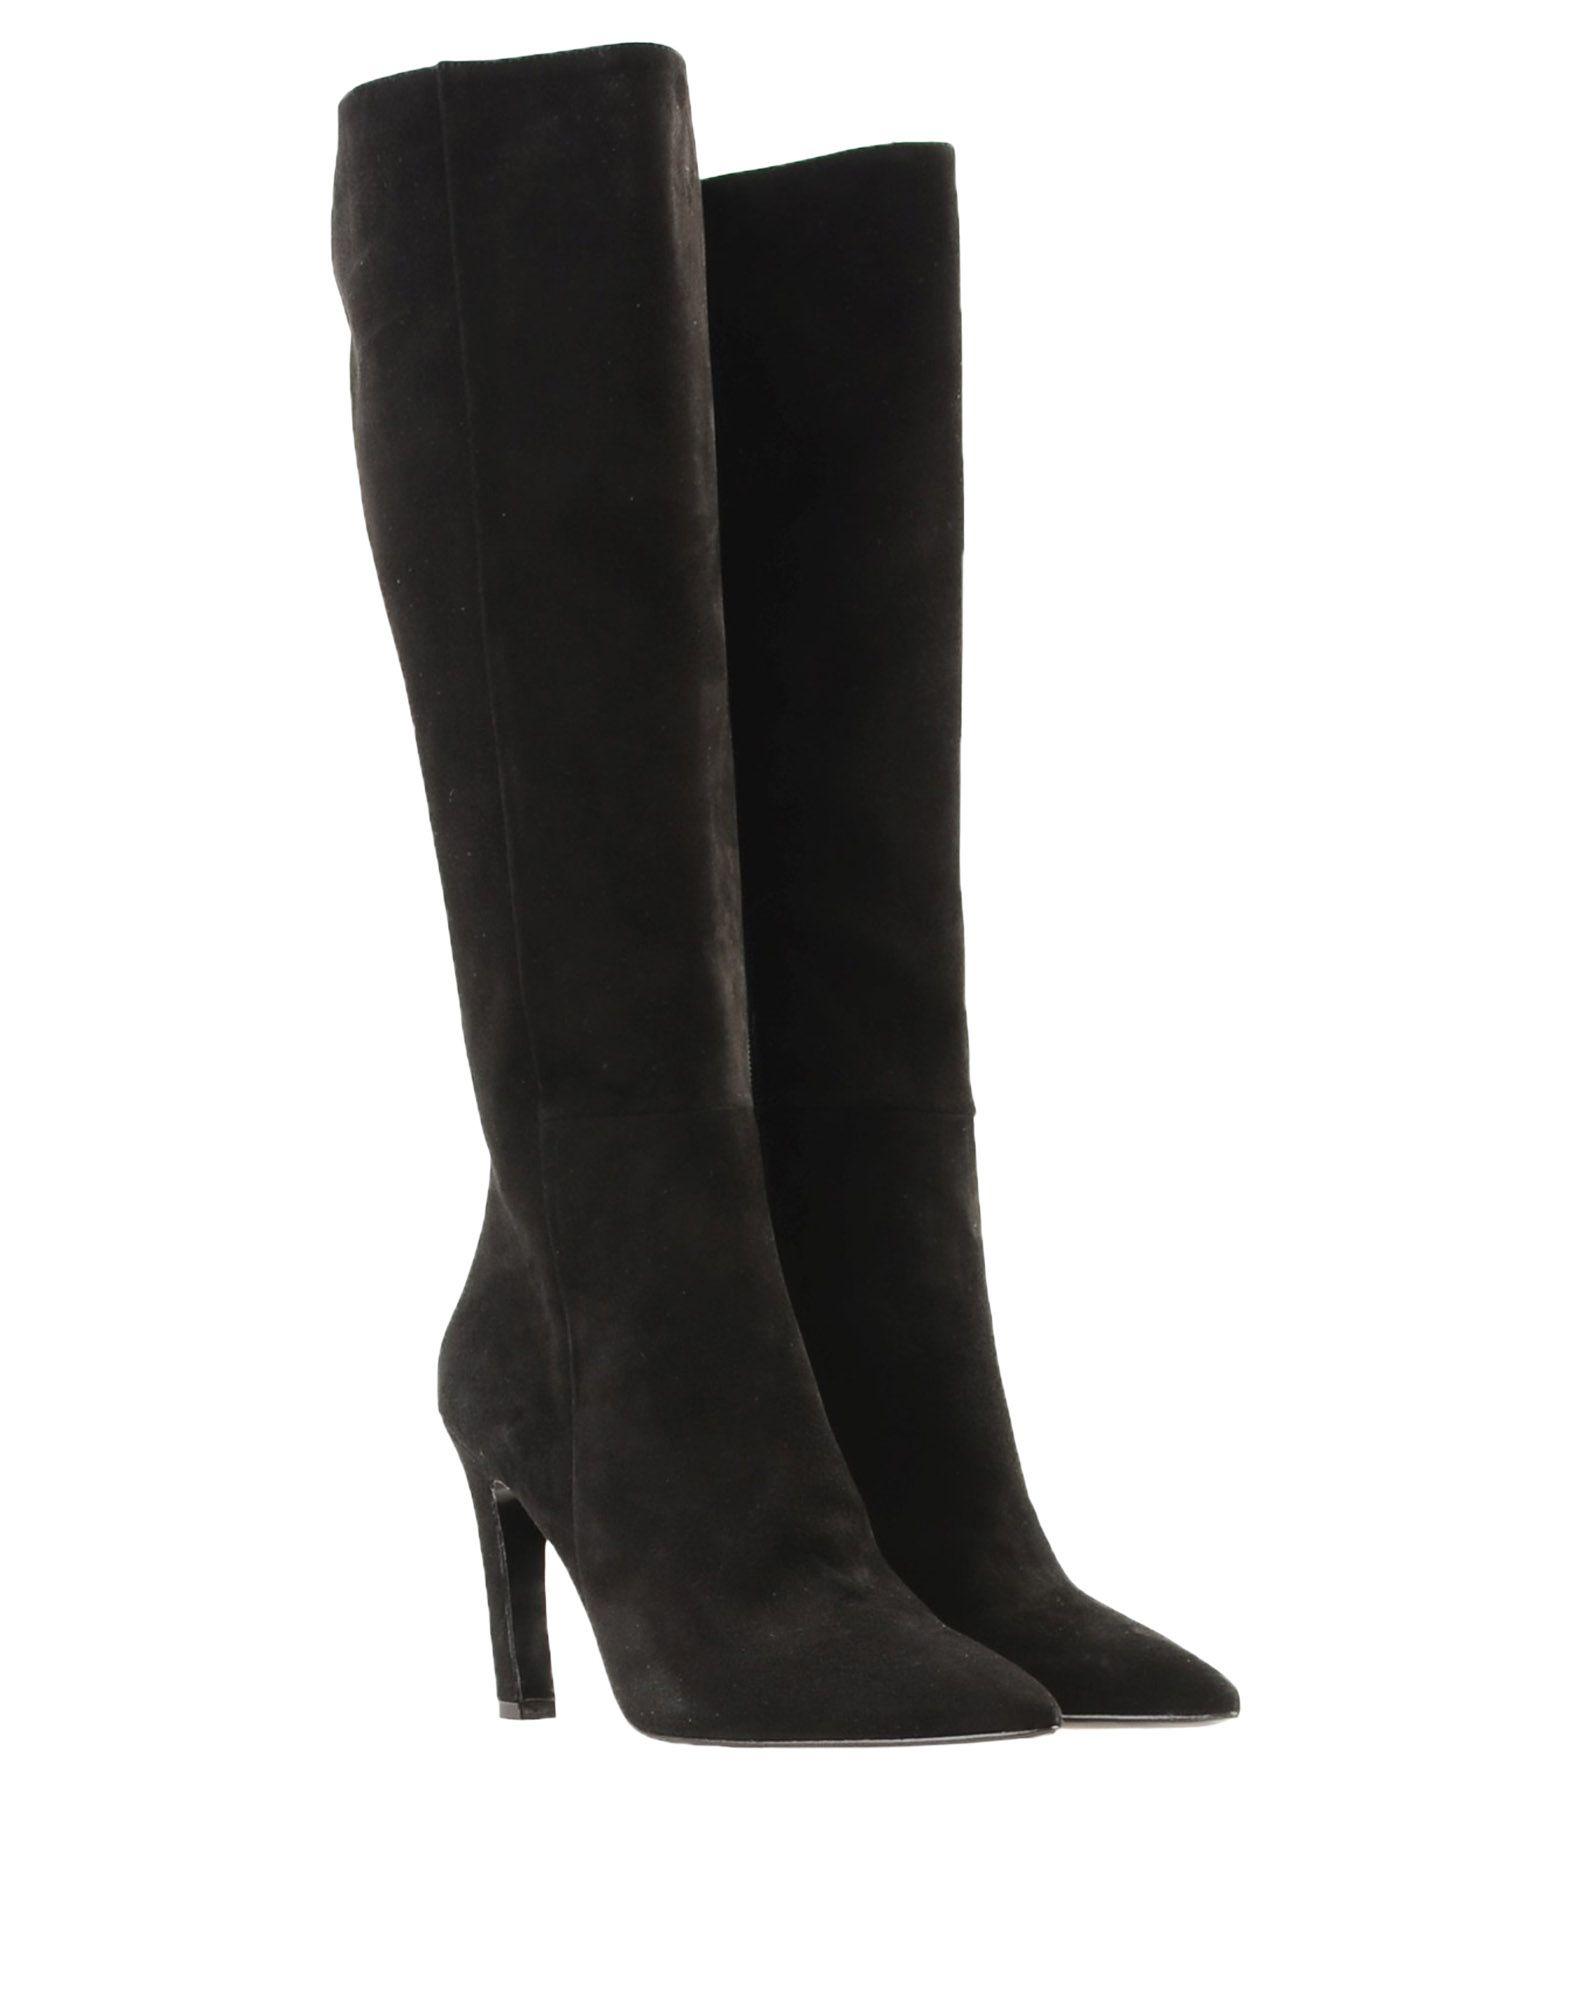 Cristian Daniel Stiefel Damen  11546486UTGut aussehende strapazierfähige strapazierfähige strapazierfähige Schuhe 38539d